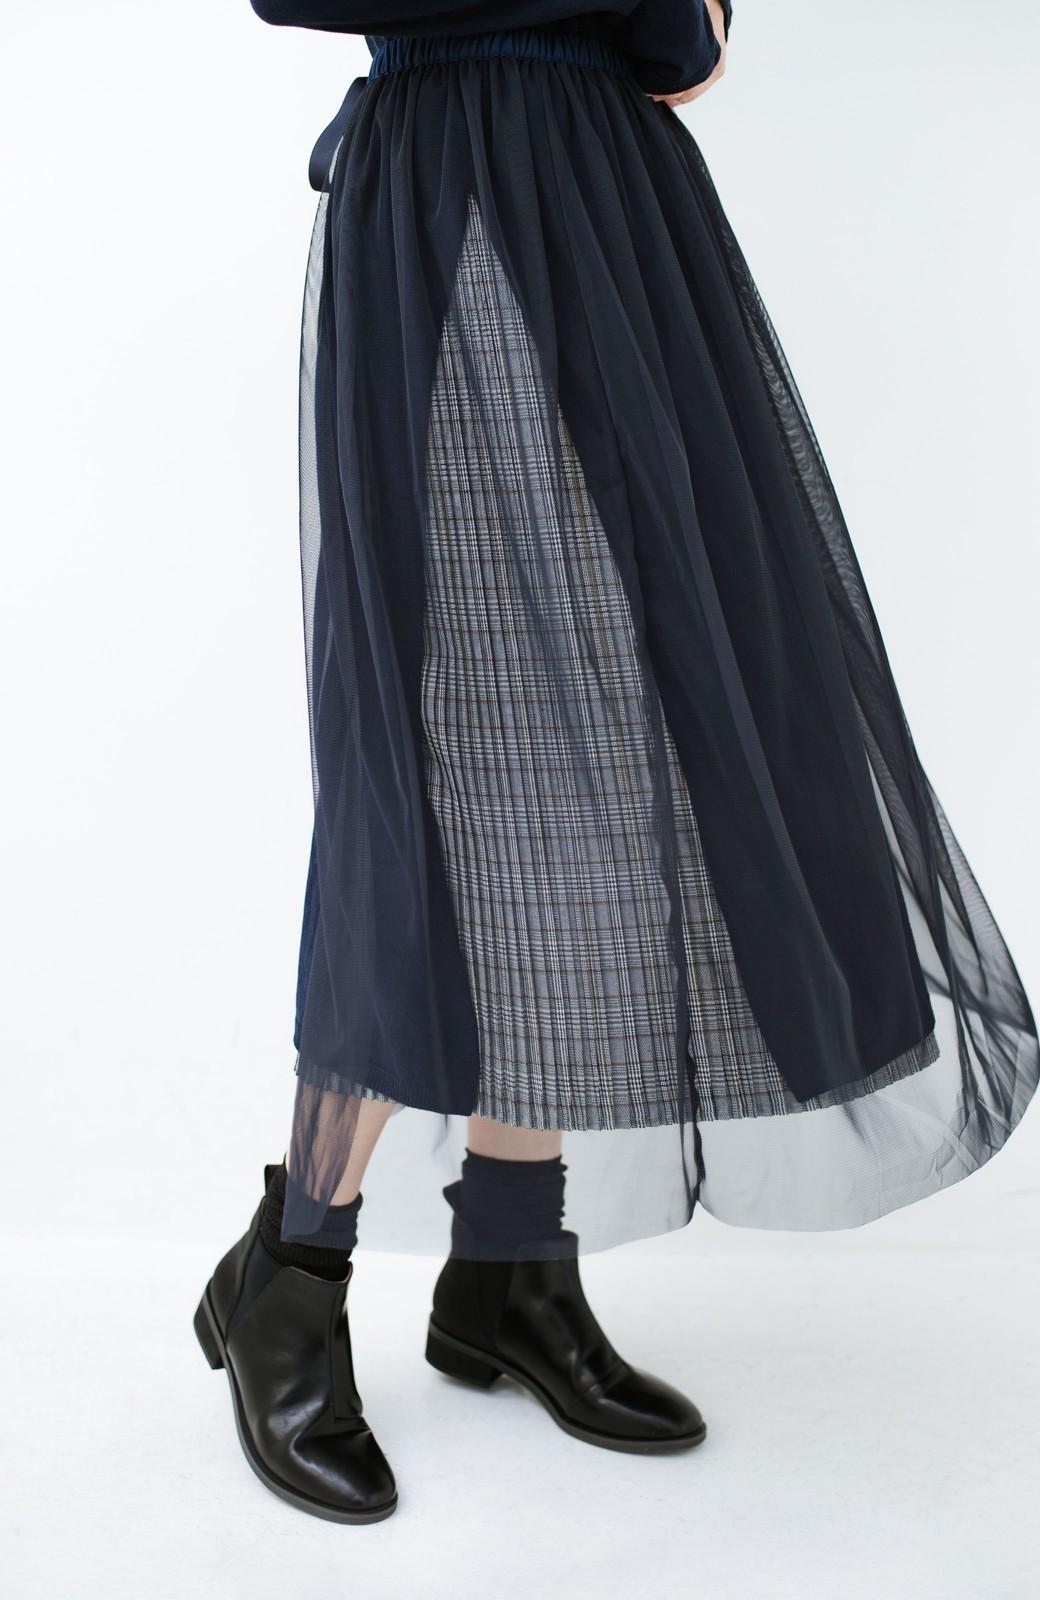 haco! 着こなし無限!自由自在なスリットロングニットとチェックプリーツスカートとチュール巻きスカートの3点セット <ネイビー>の商品写真6